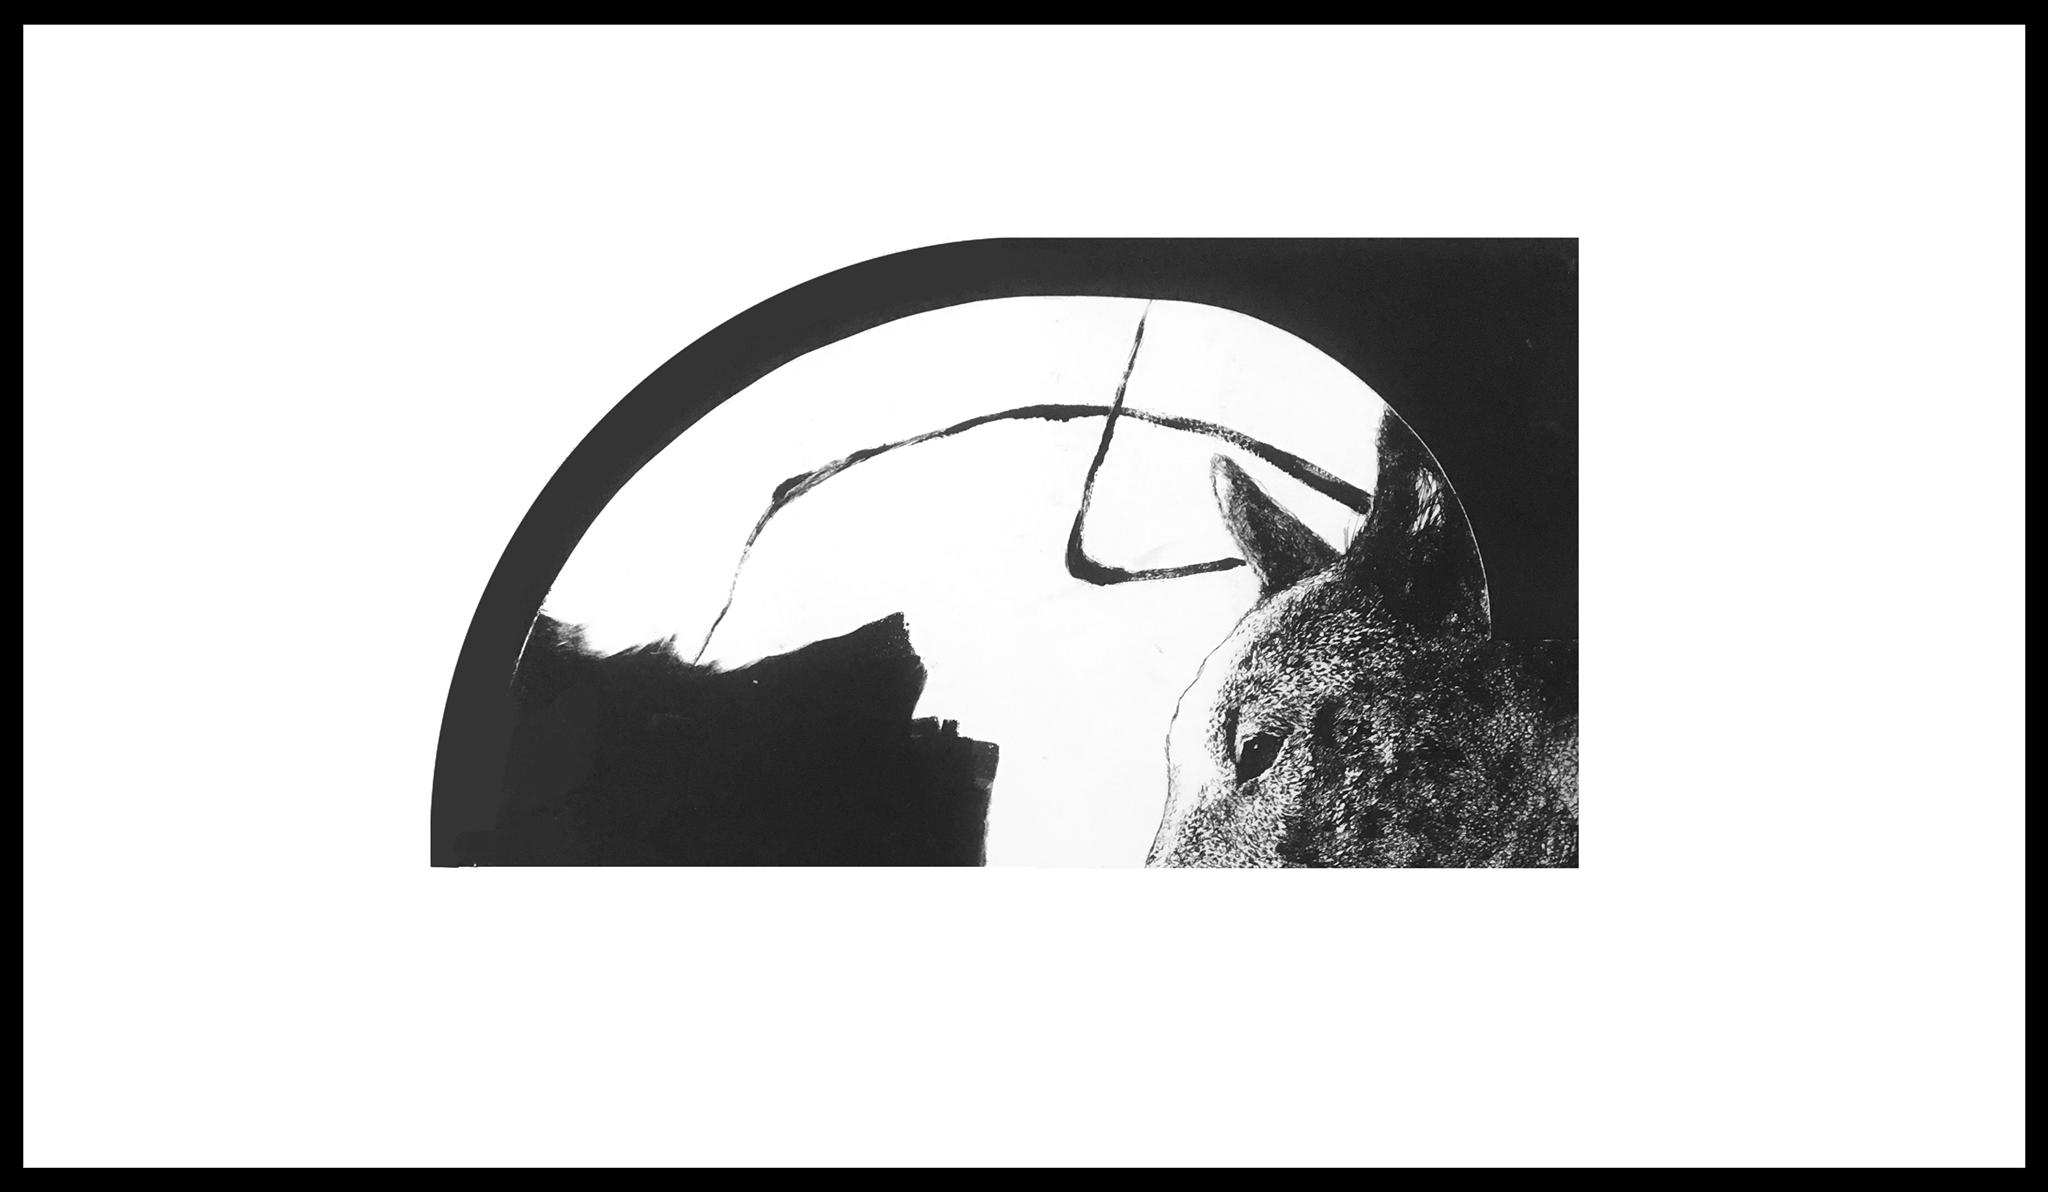 Катерина Сад. Пес, 2018; суха голка, монотипія, 50х70